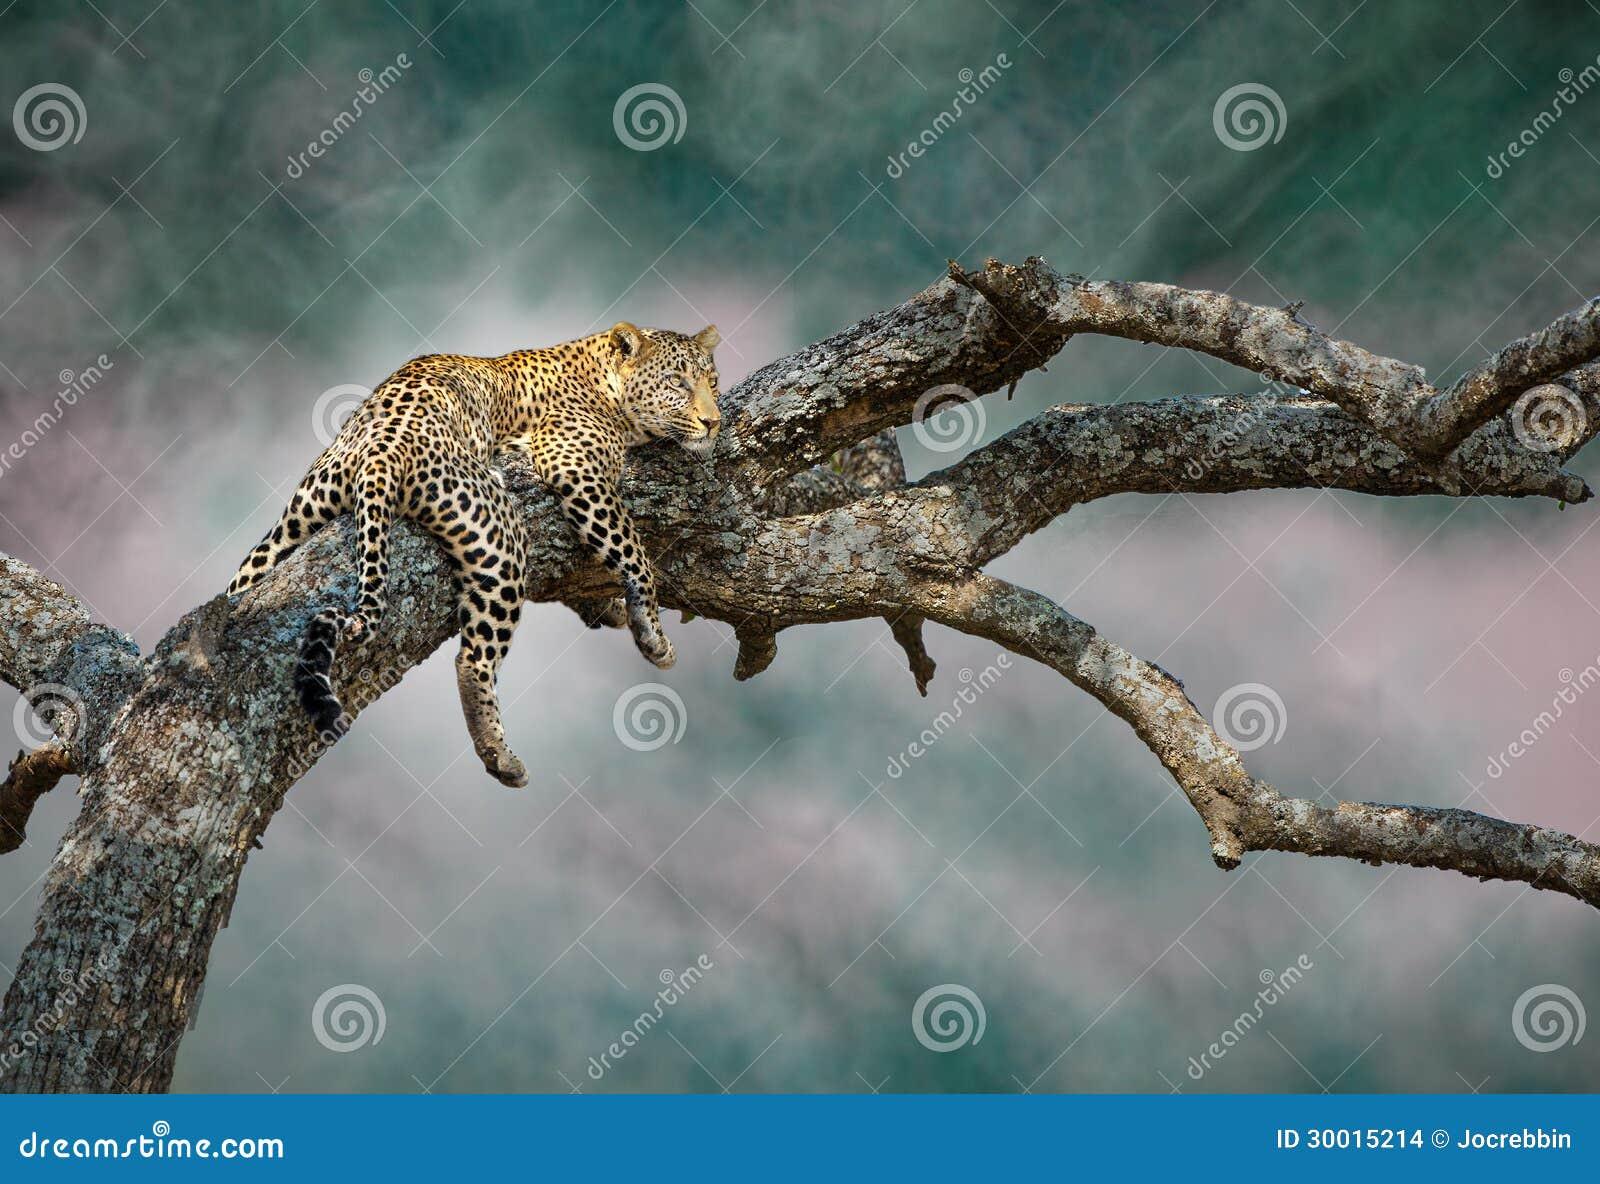 Le léopard évasif